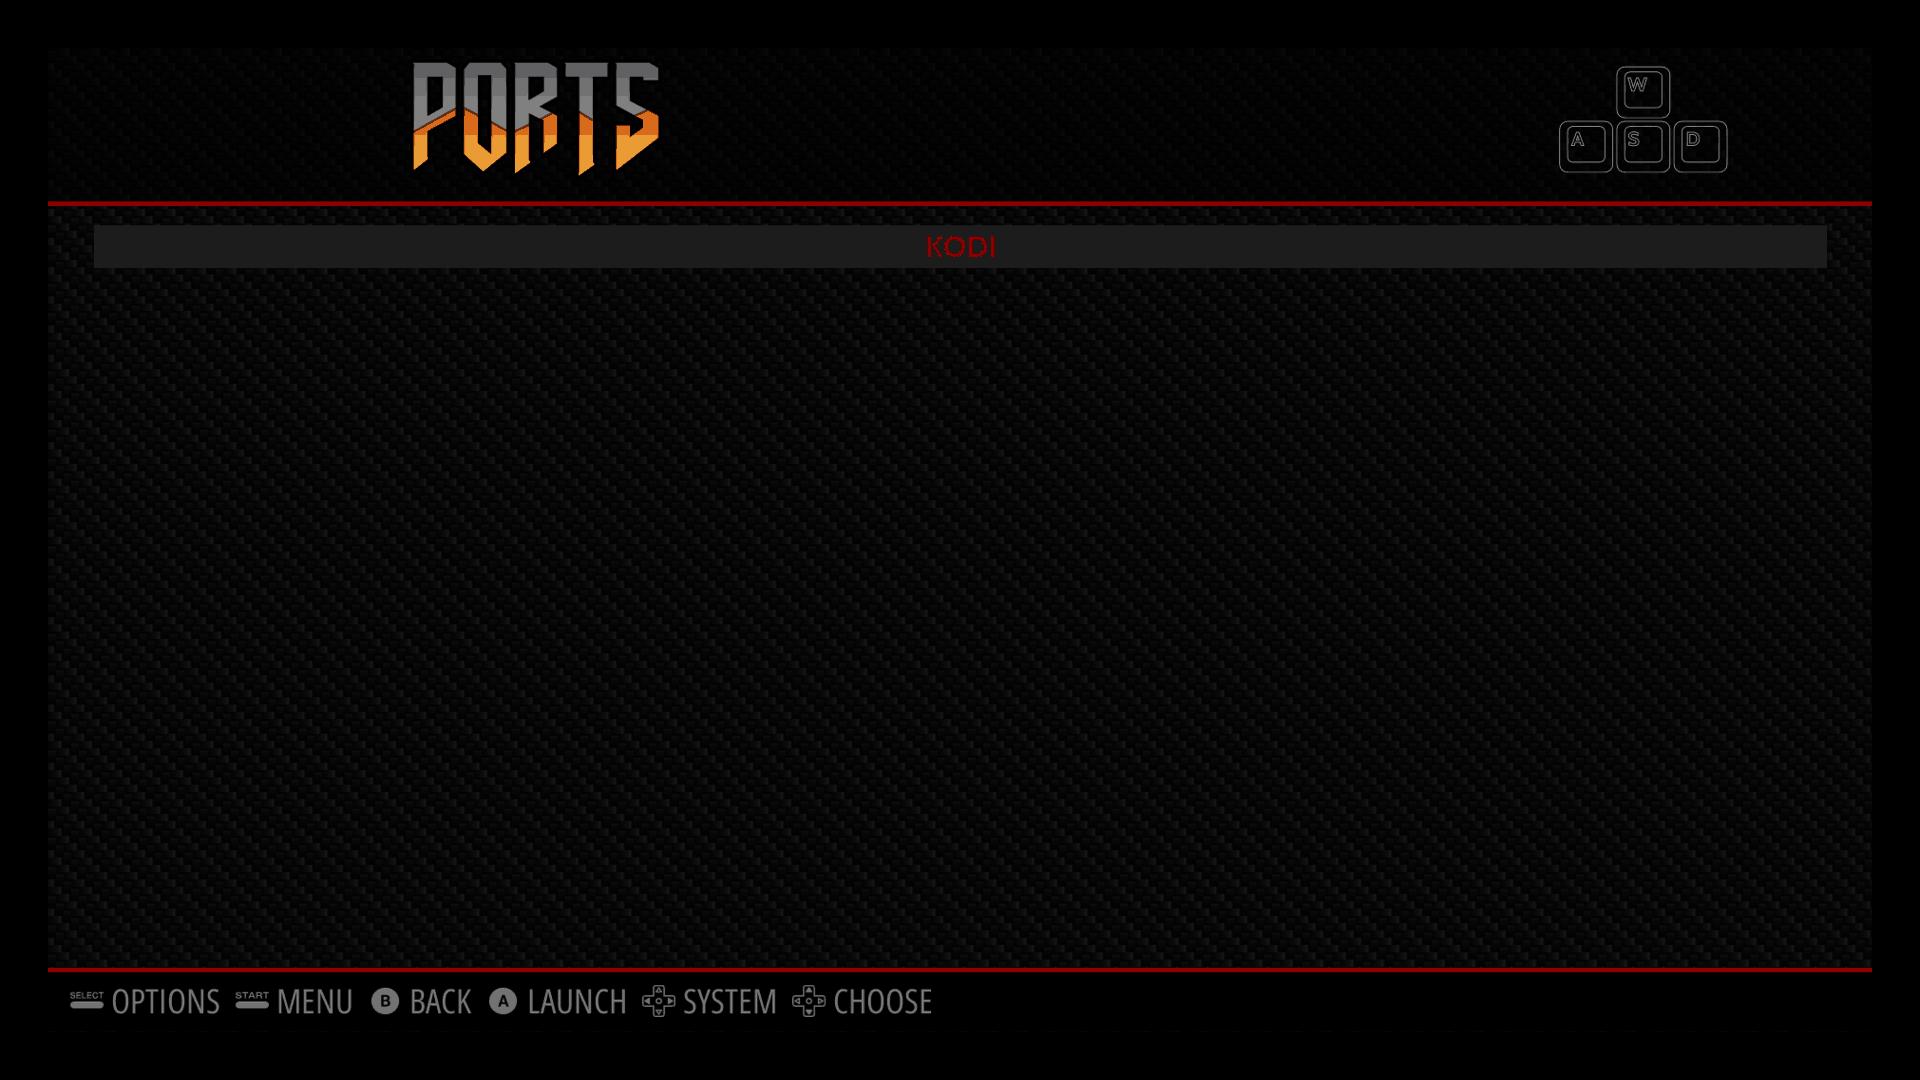 Kodi on RetroPie - Ports menu